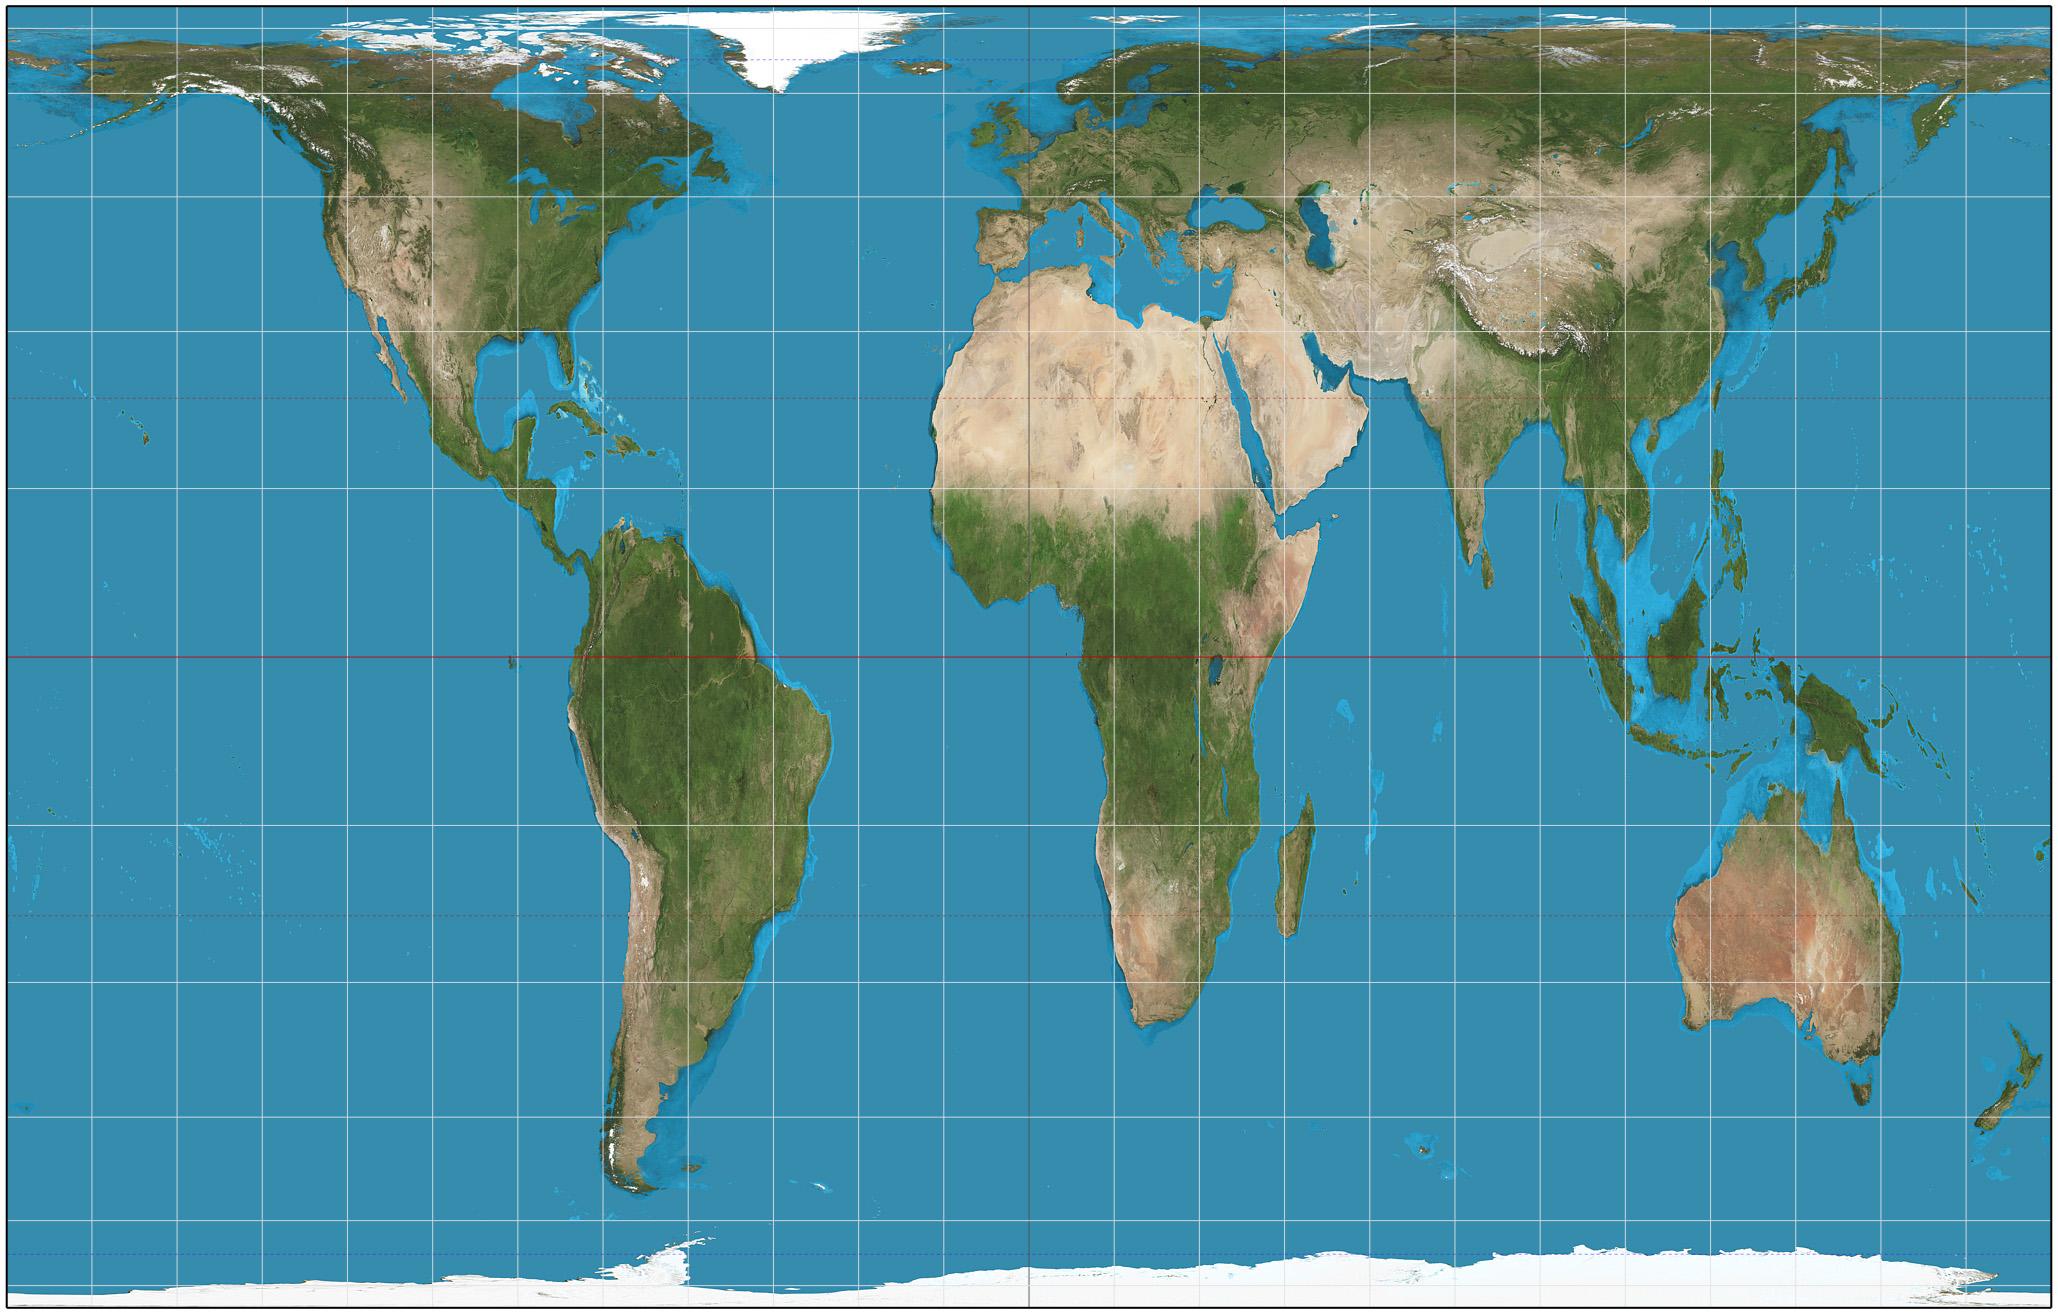 Mapy Sveta Zkresluji Velikosti Kontinentu Nadrzuji Kdysi